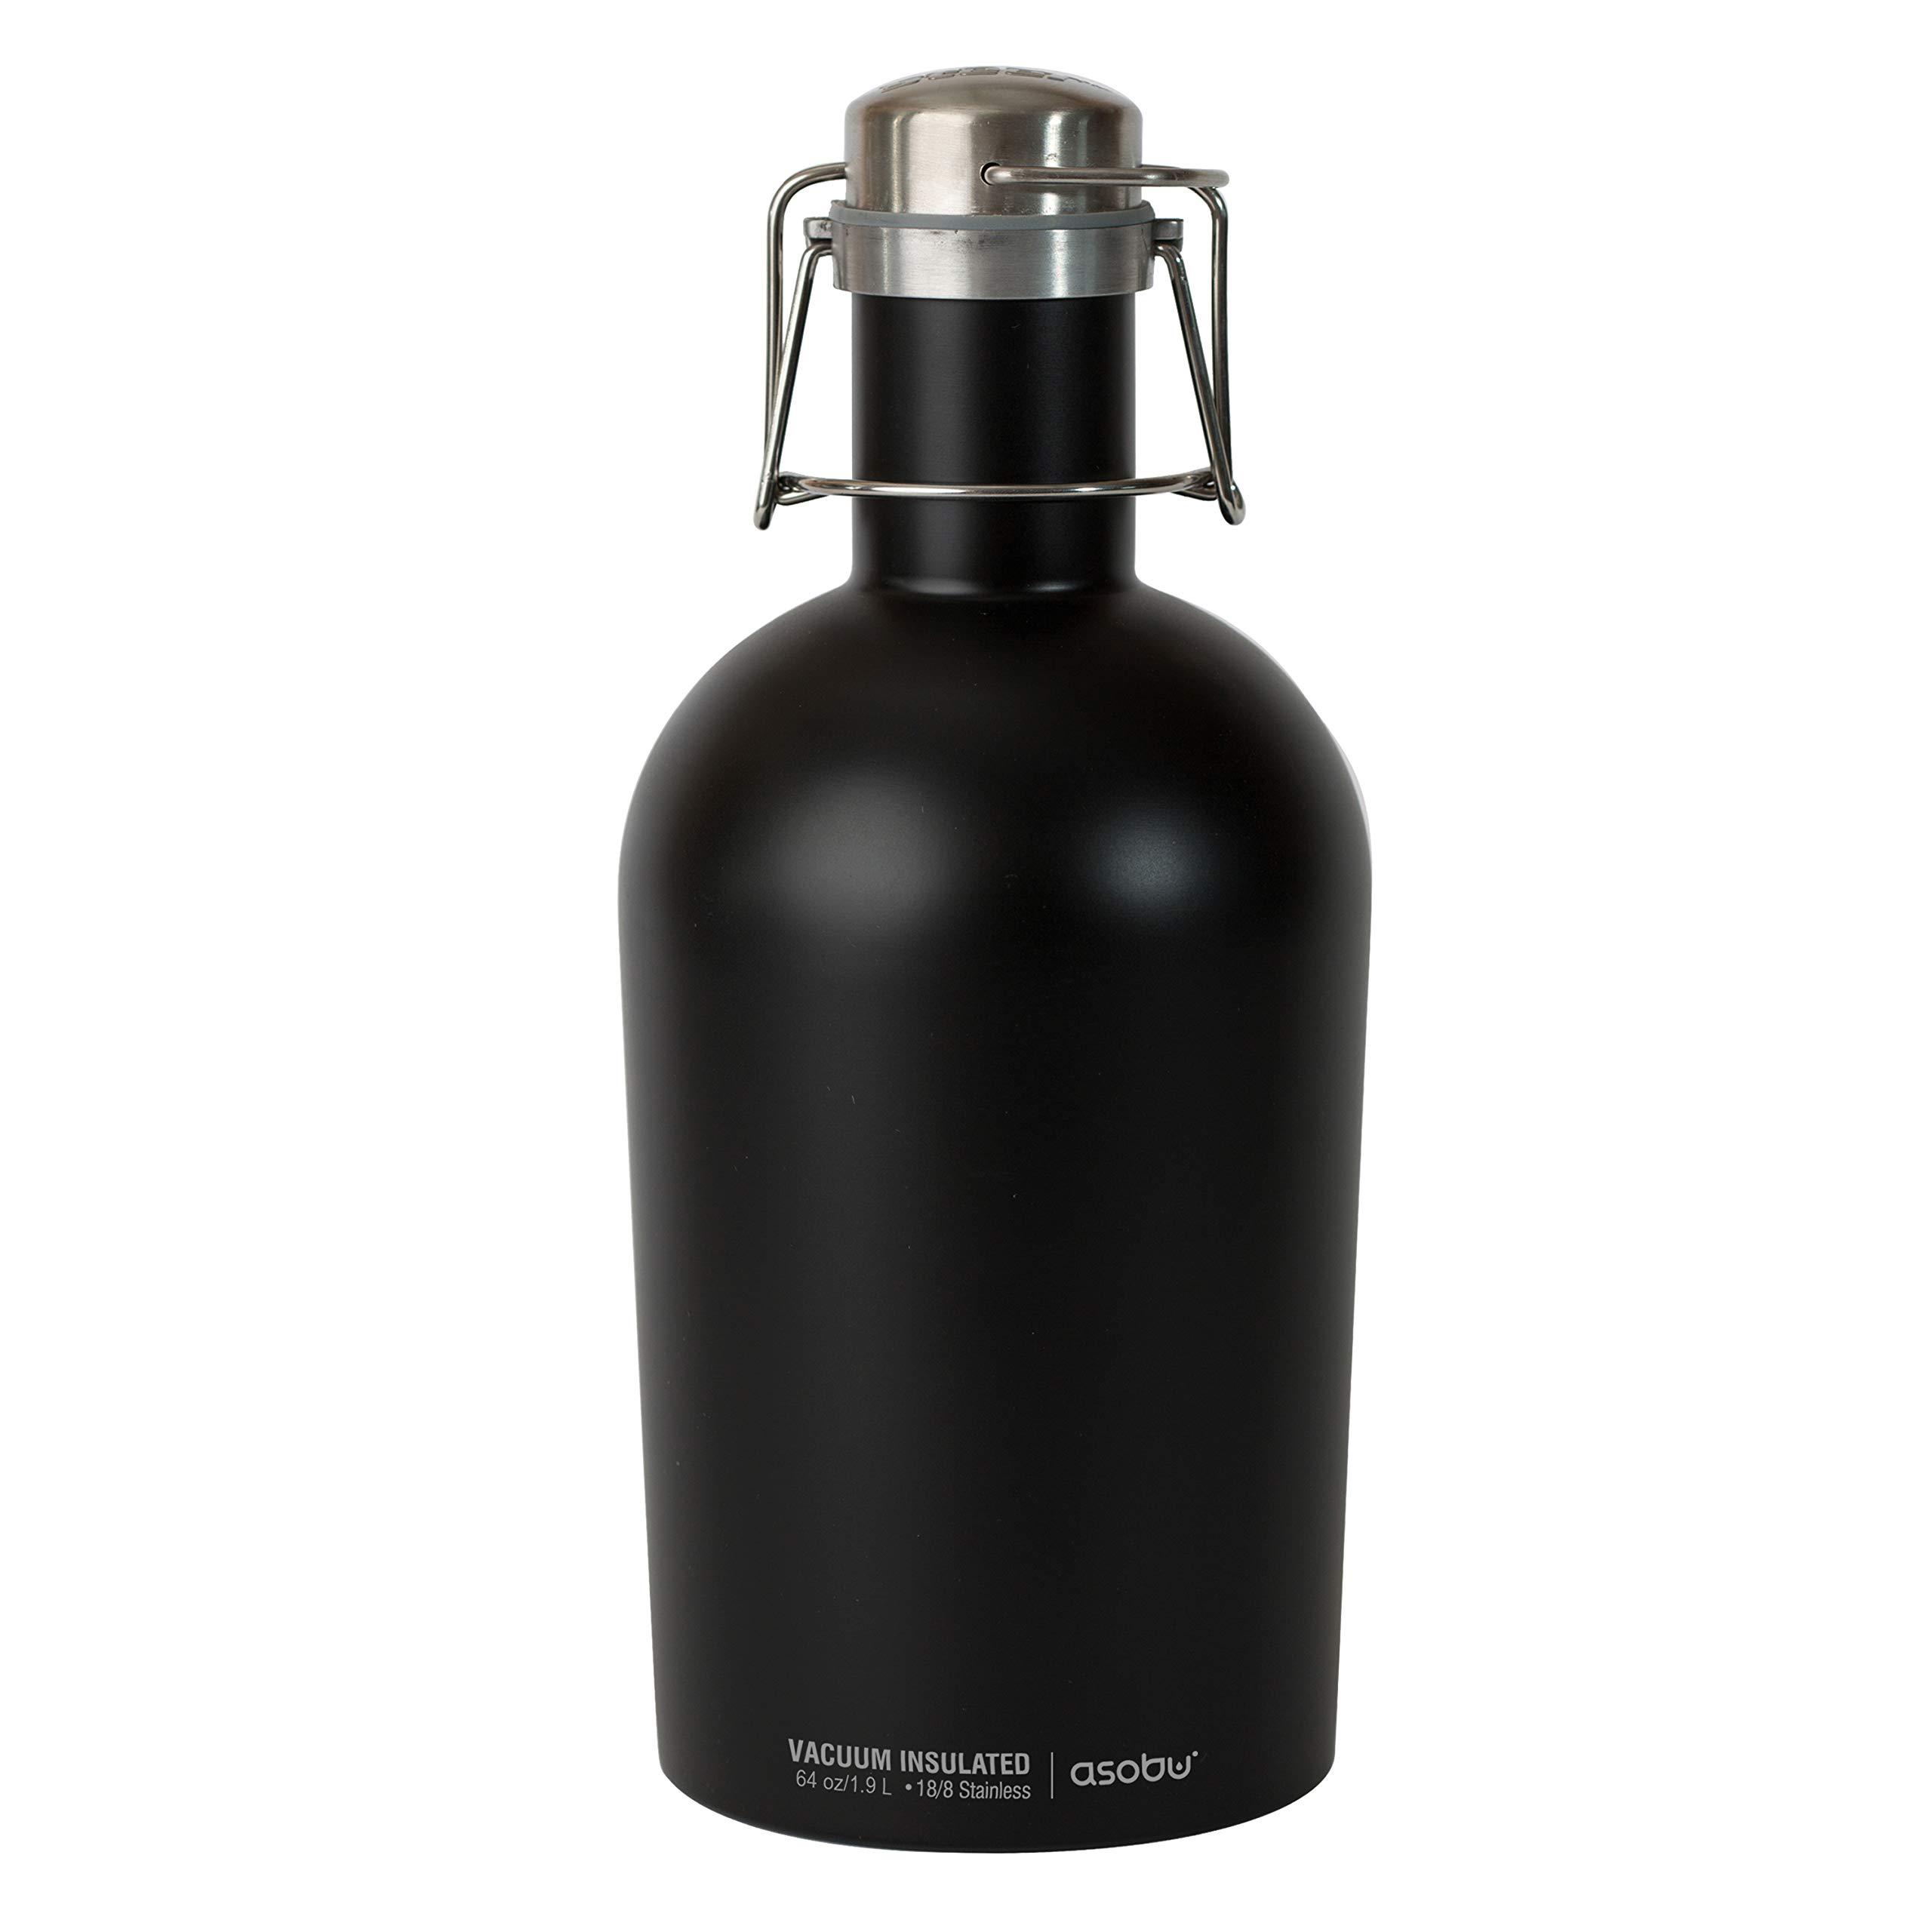 Asobu G2G-9241 Coolest Stainless Steel Beer Growler 2 Go, 64 oz, Black